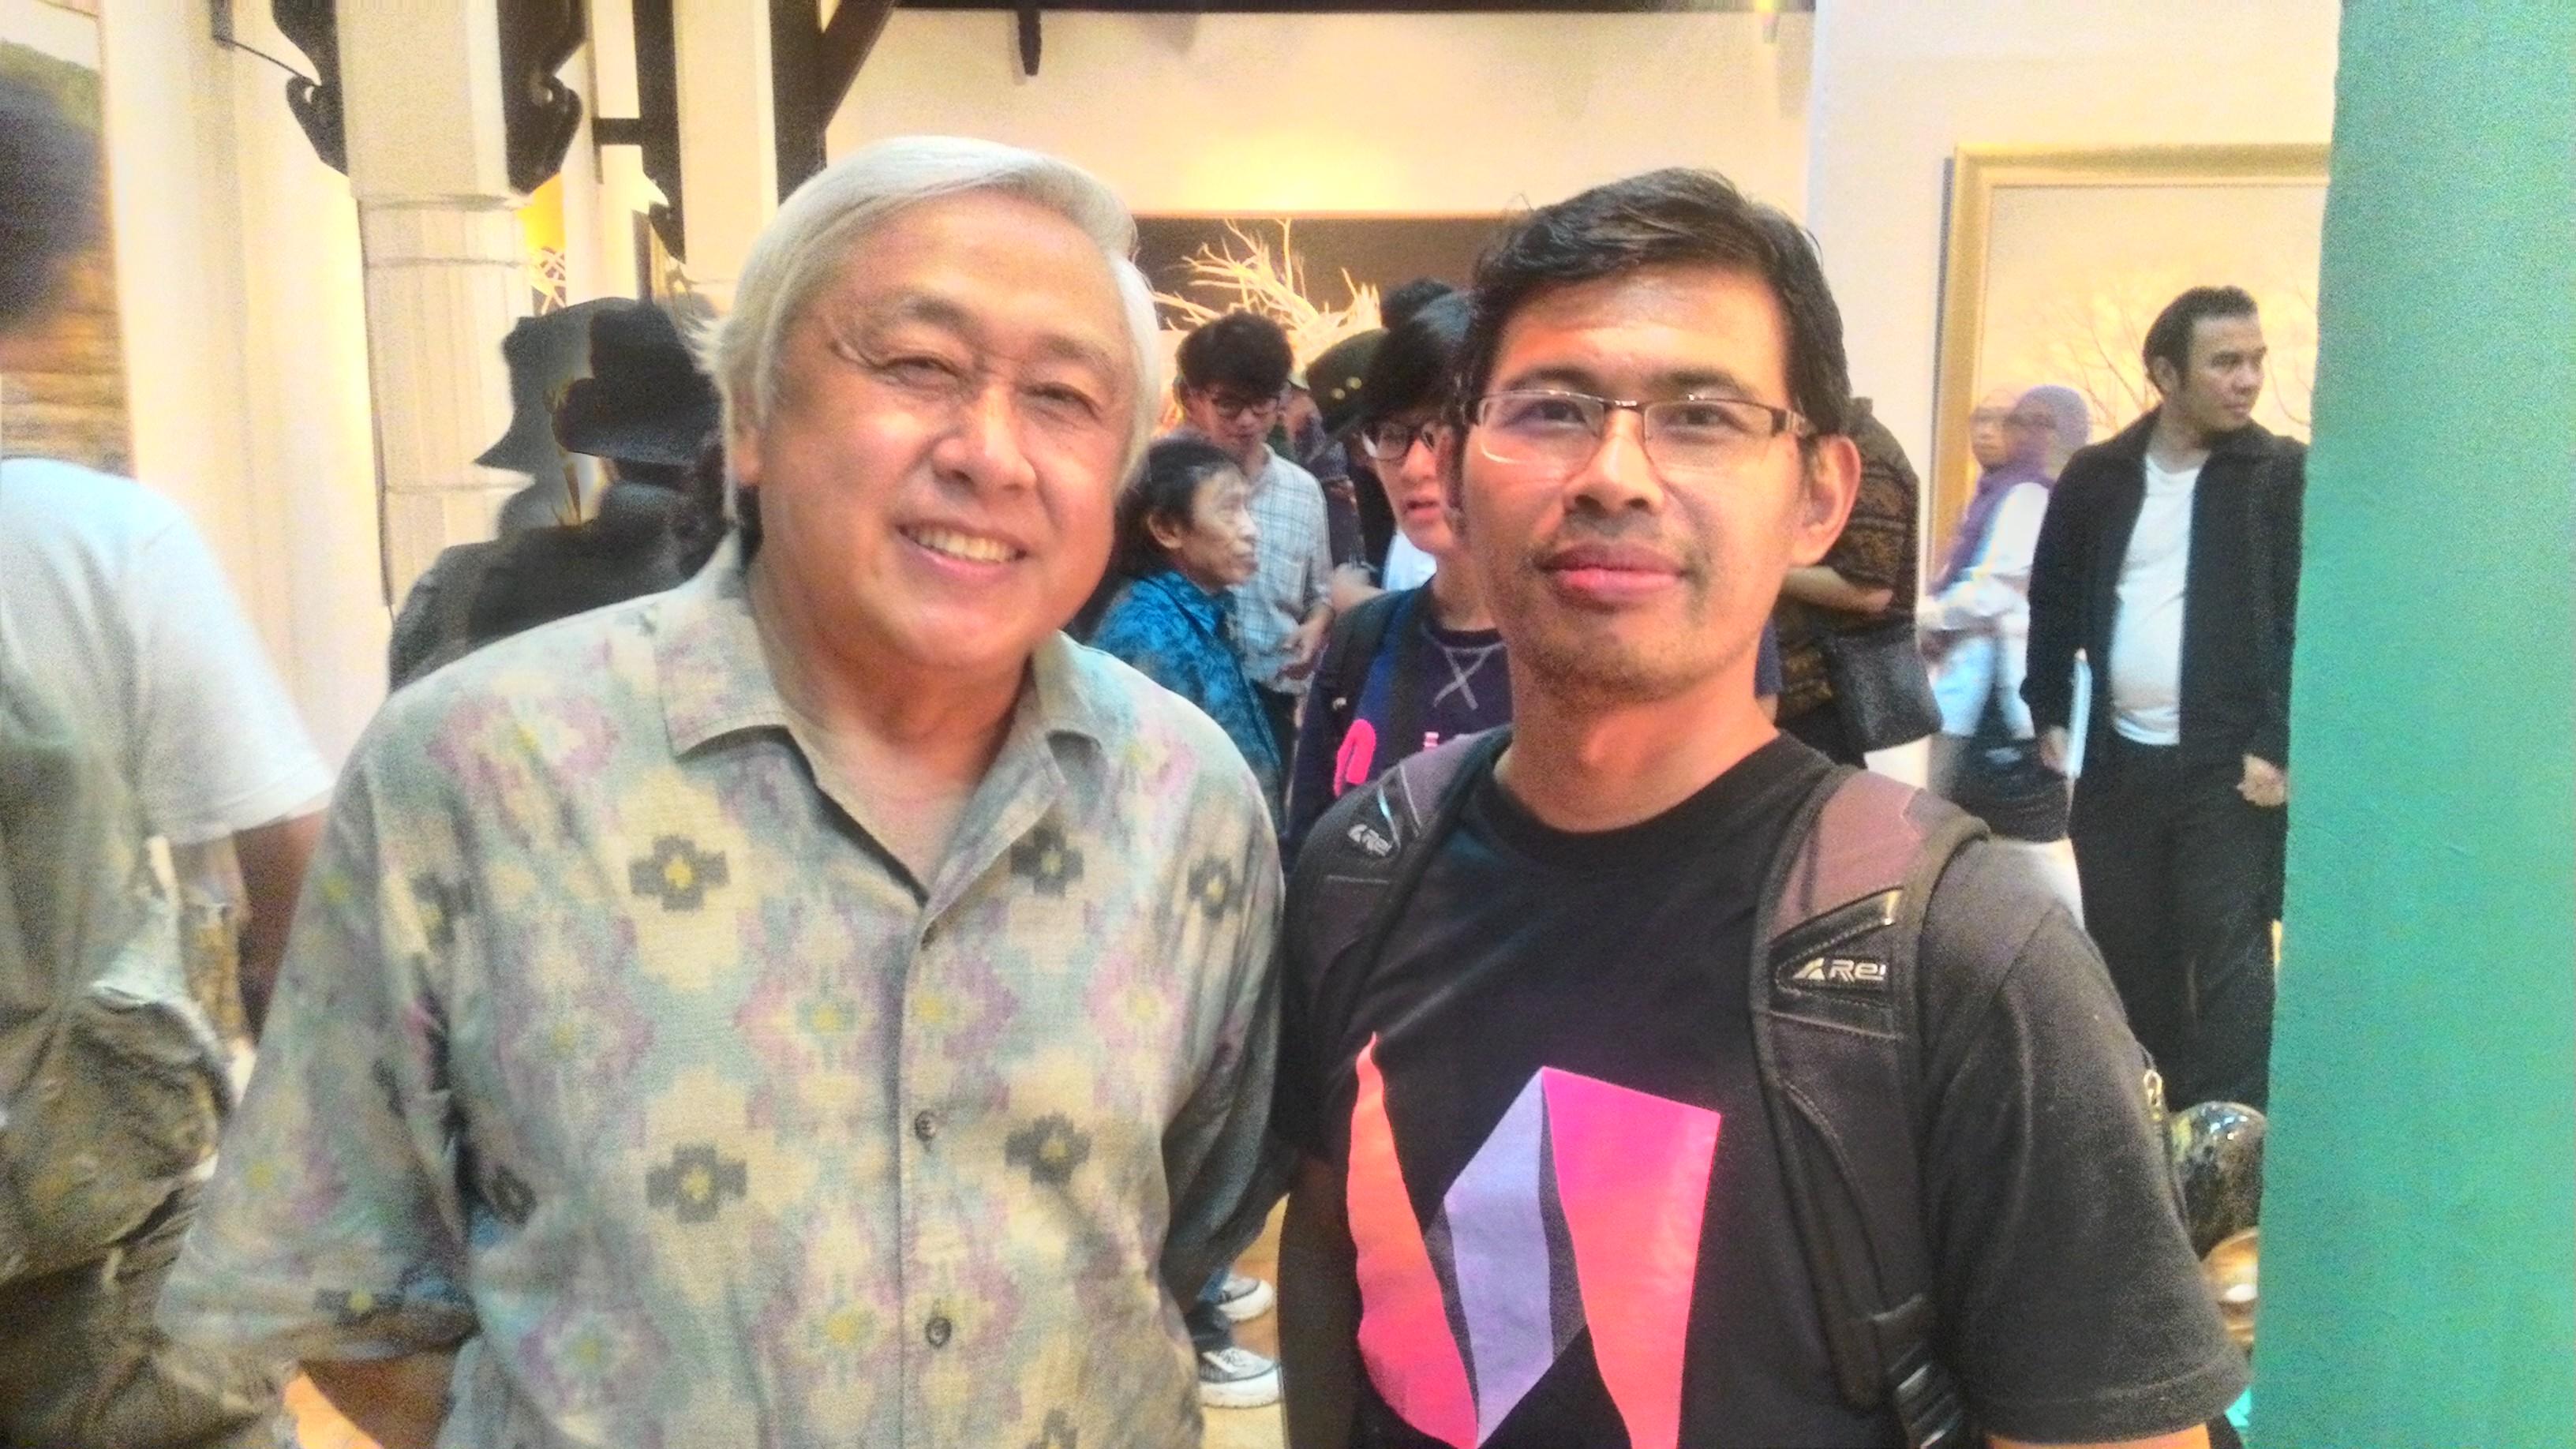 Penulis bersama Agus Dermawan T pengamat,kurator terkenal|Dokumentasi pribadi